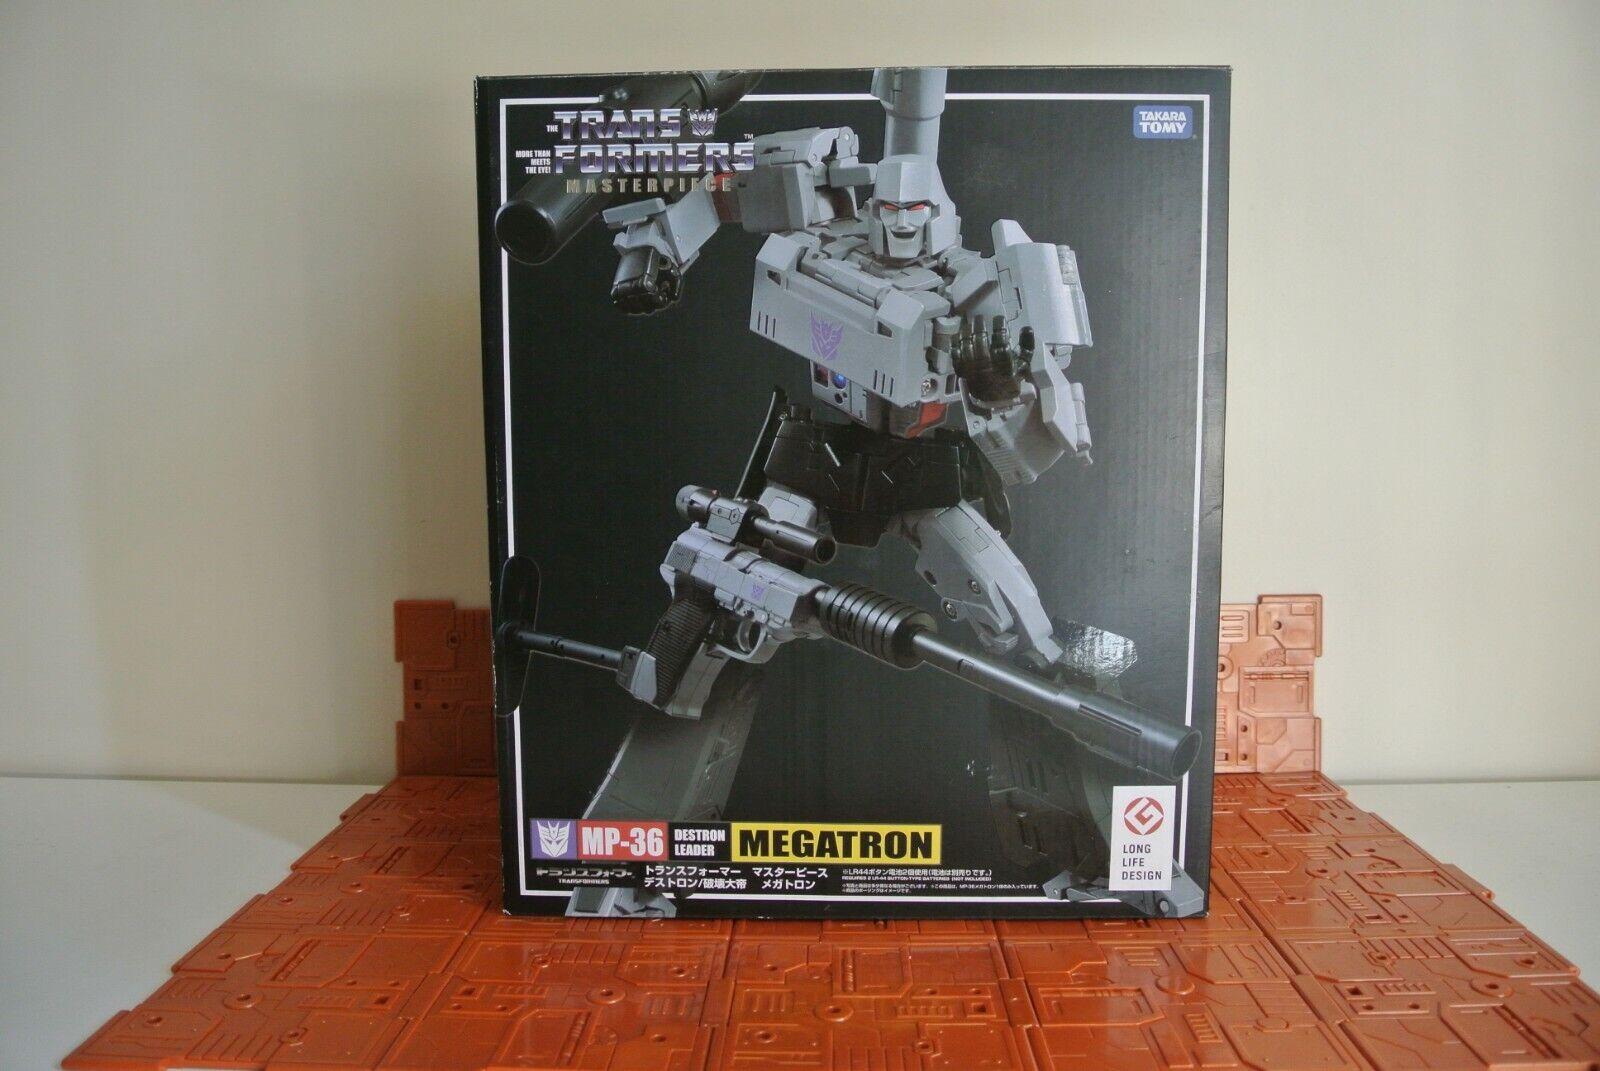 Takara Transformers MP36 Megatron & Infinite IT01 Megatron